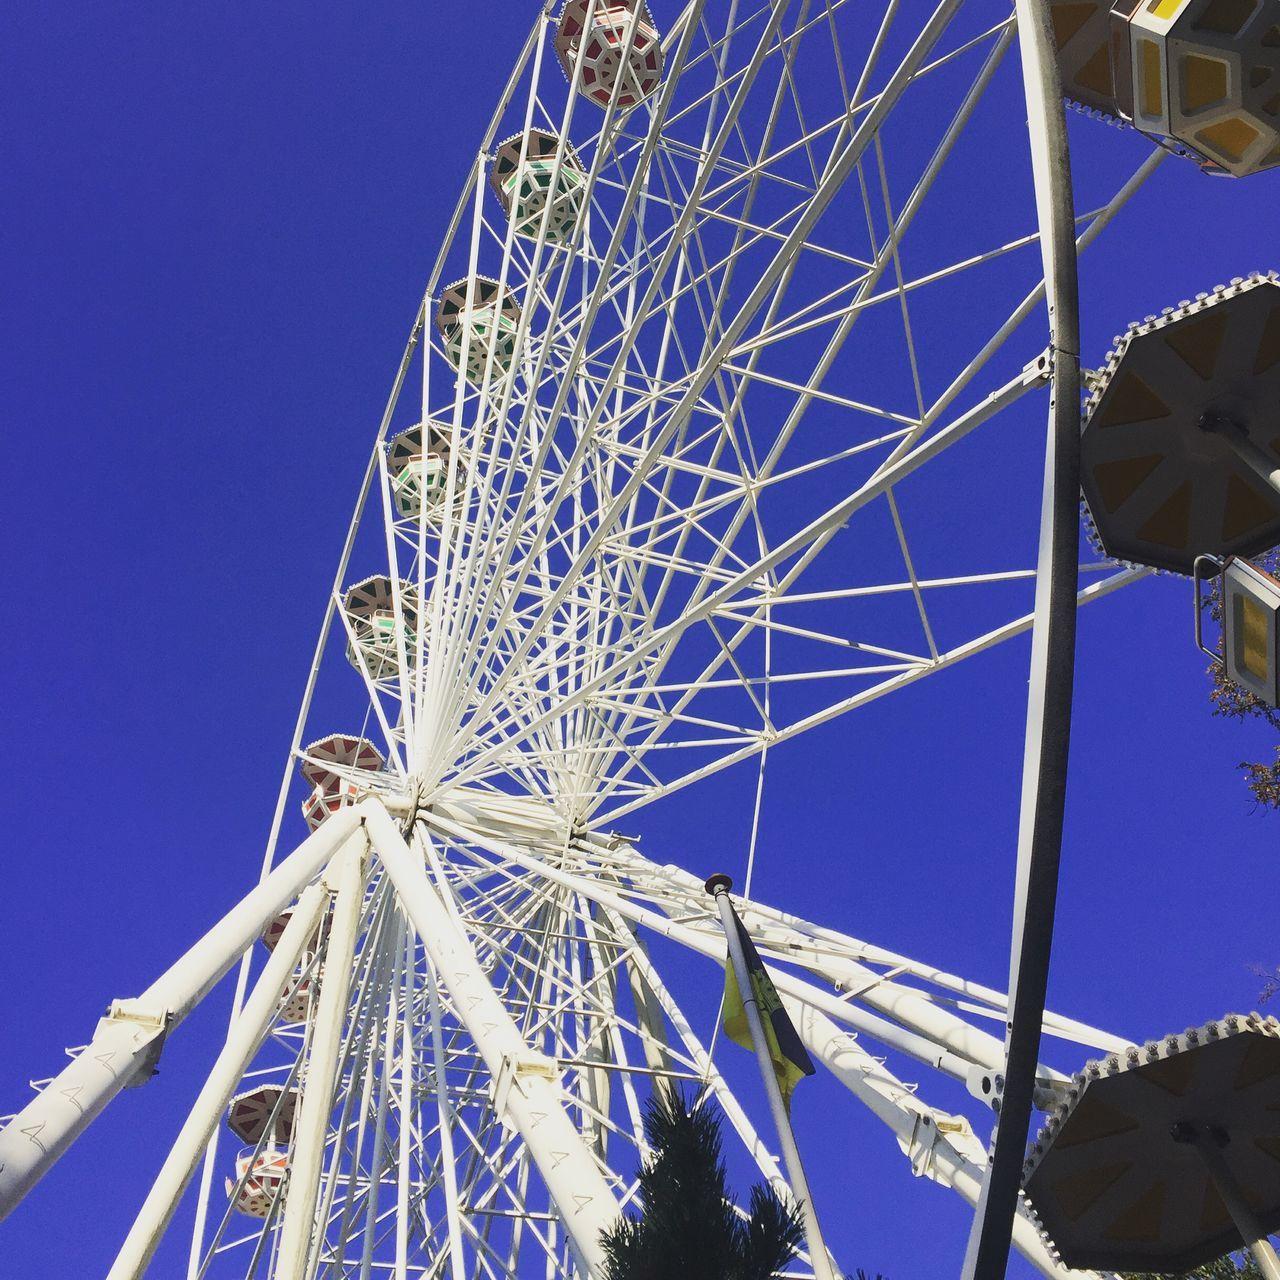 Amusement Park Big Wheel Blau Blue Ferris Wheel Himmel Riesenrad Sky Vergnügungspark